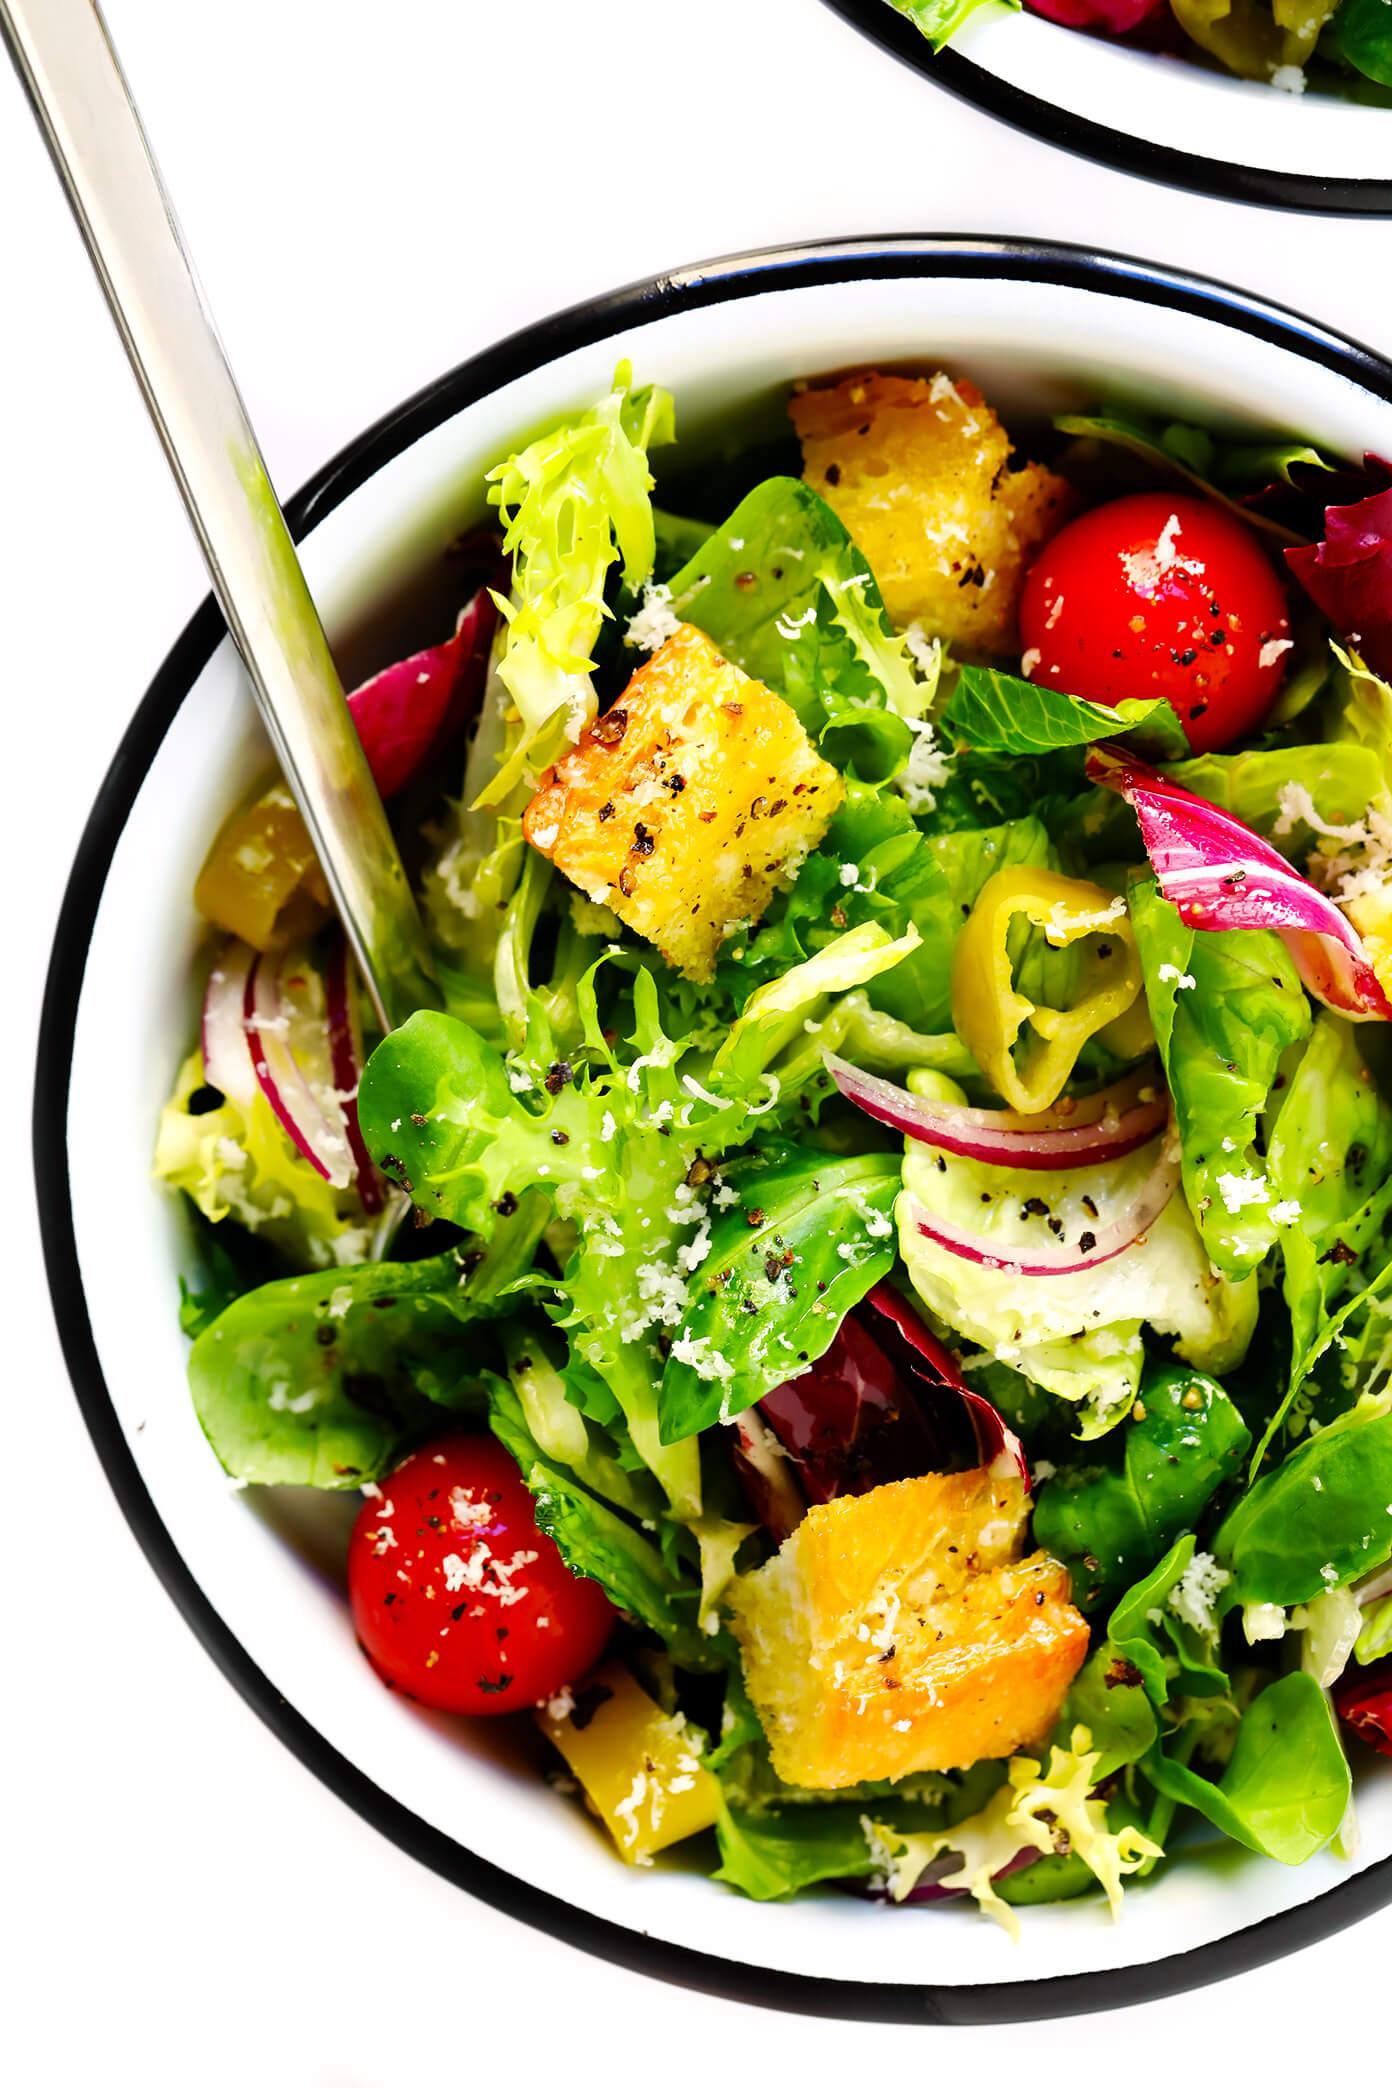 Copycat Olive Garden Salad Recipe